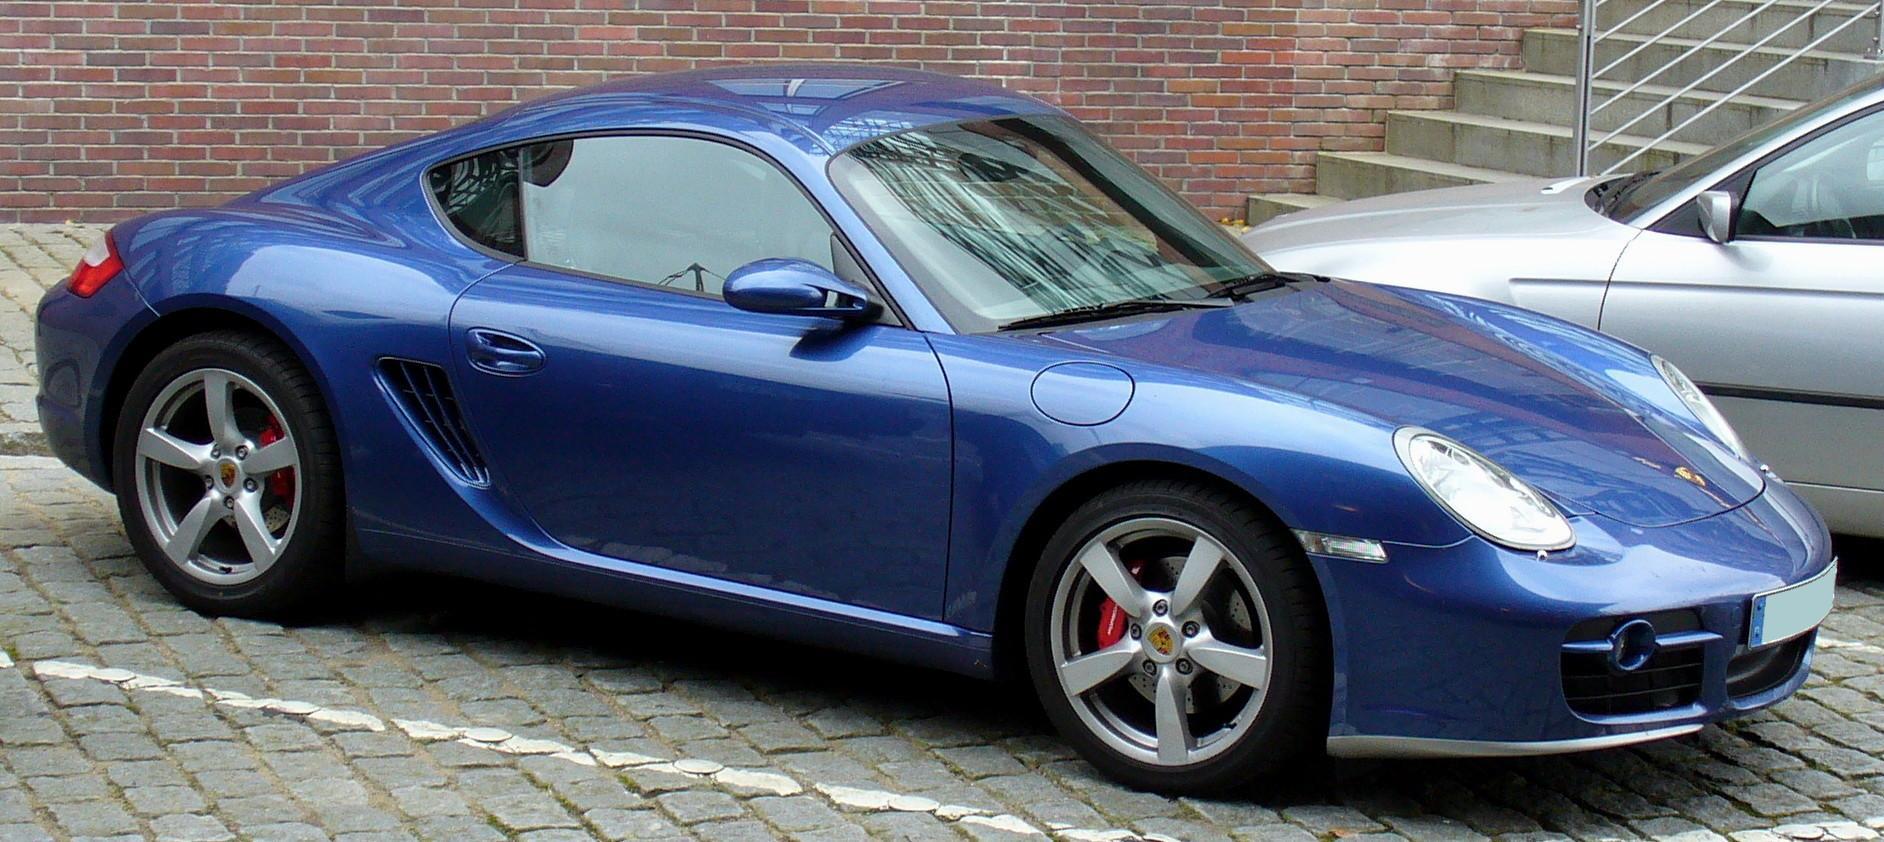 Porsche Graphite Blue Metallic Paint